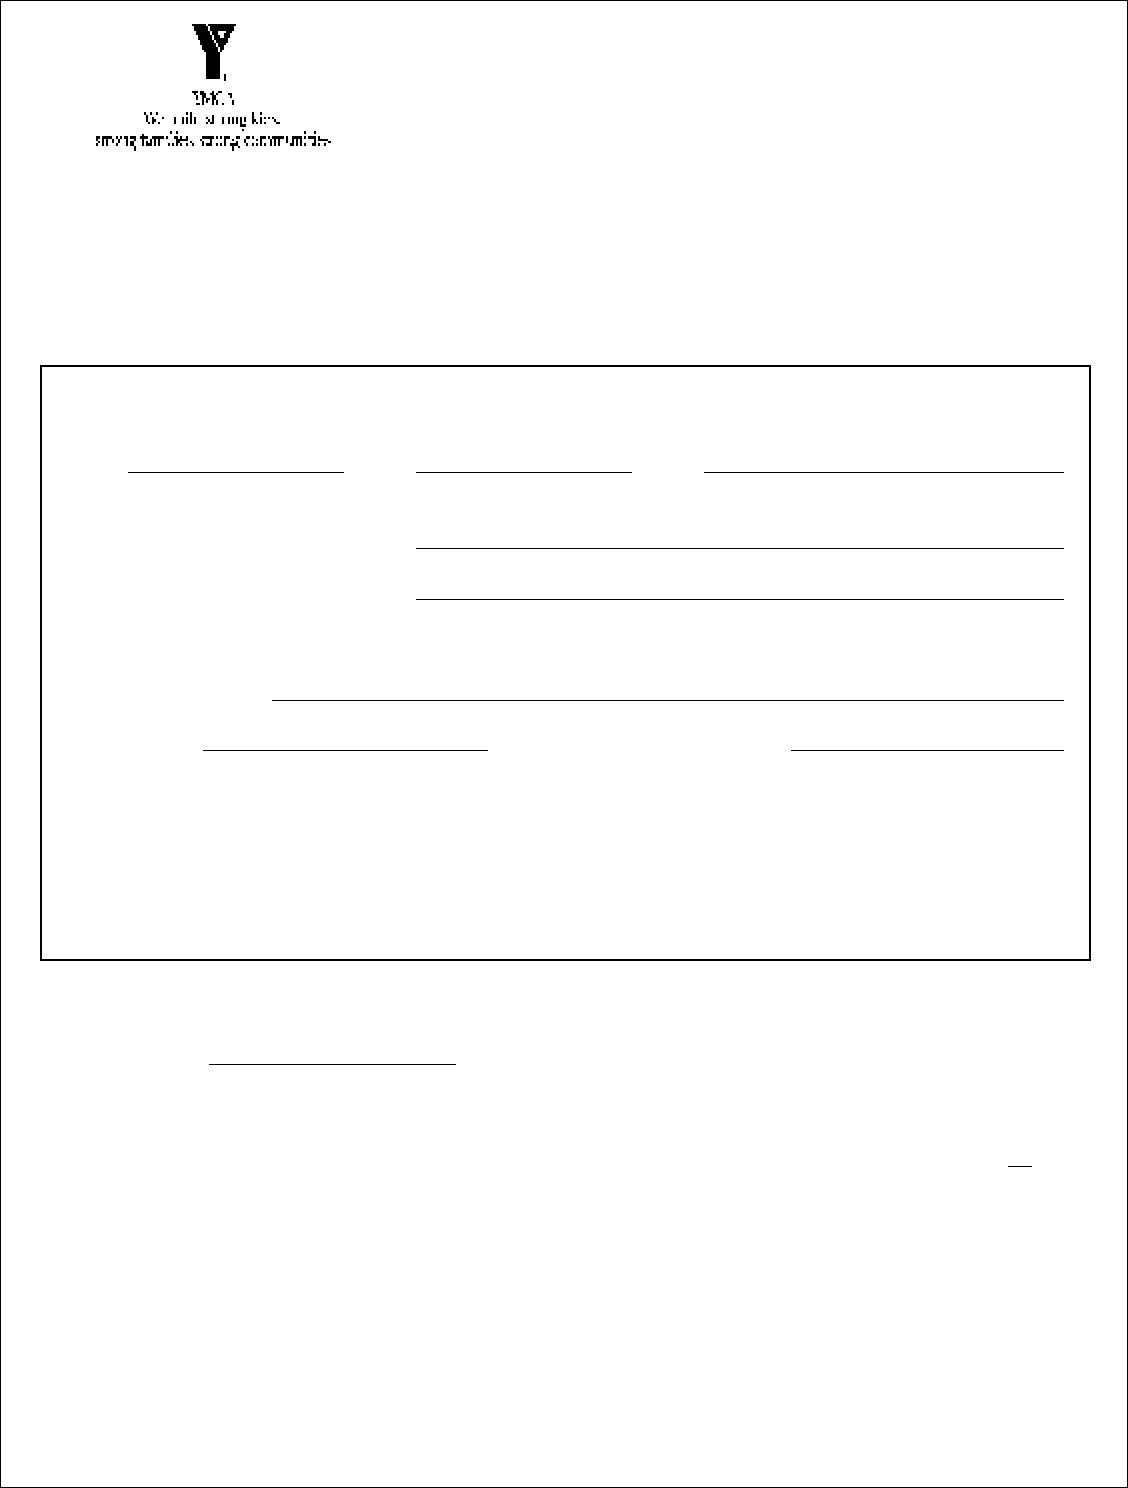 Free Printable YMCA Job Application Form